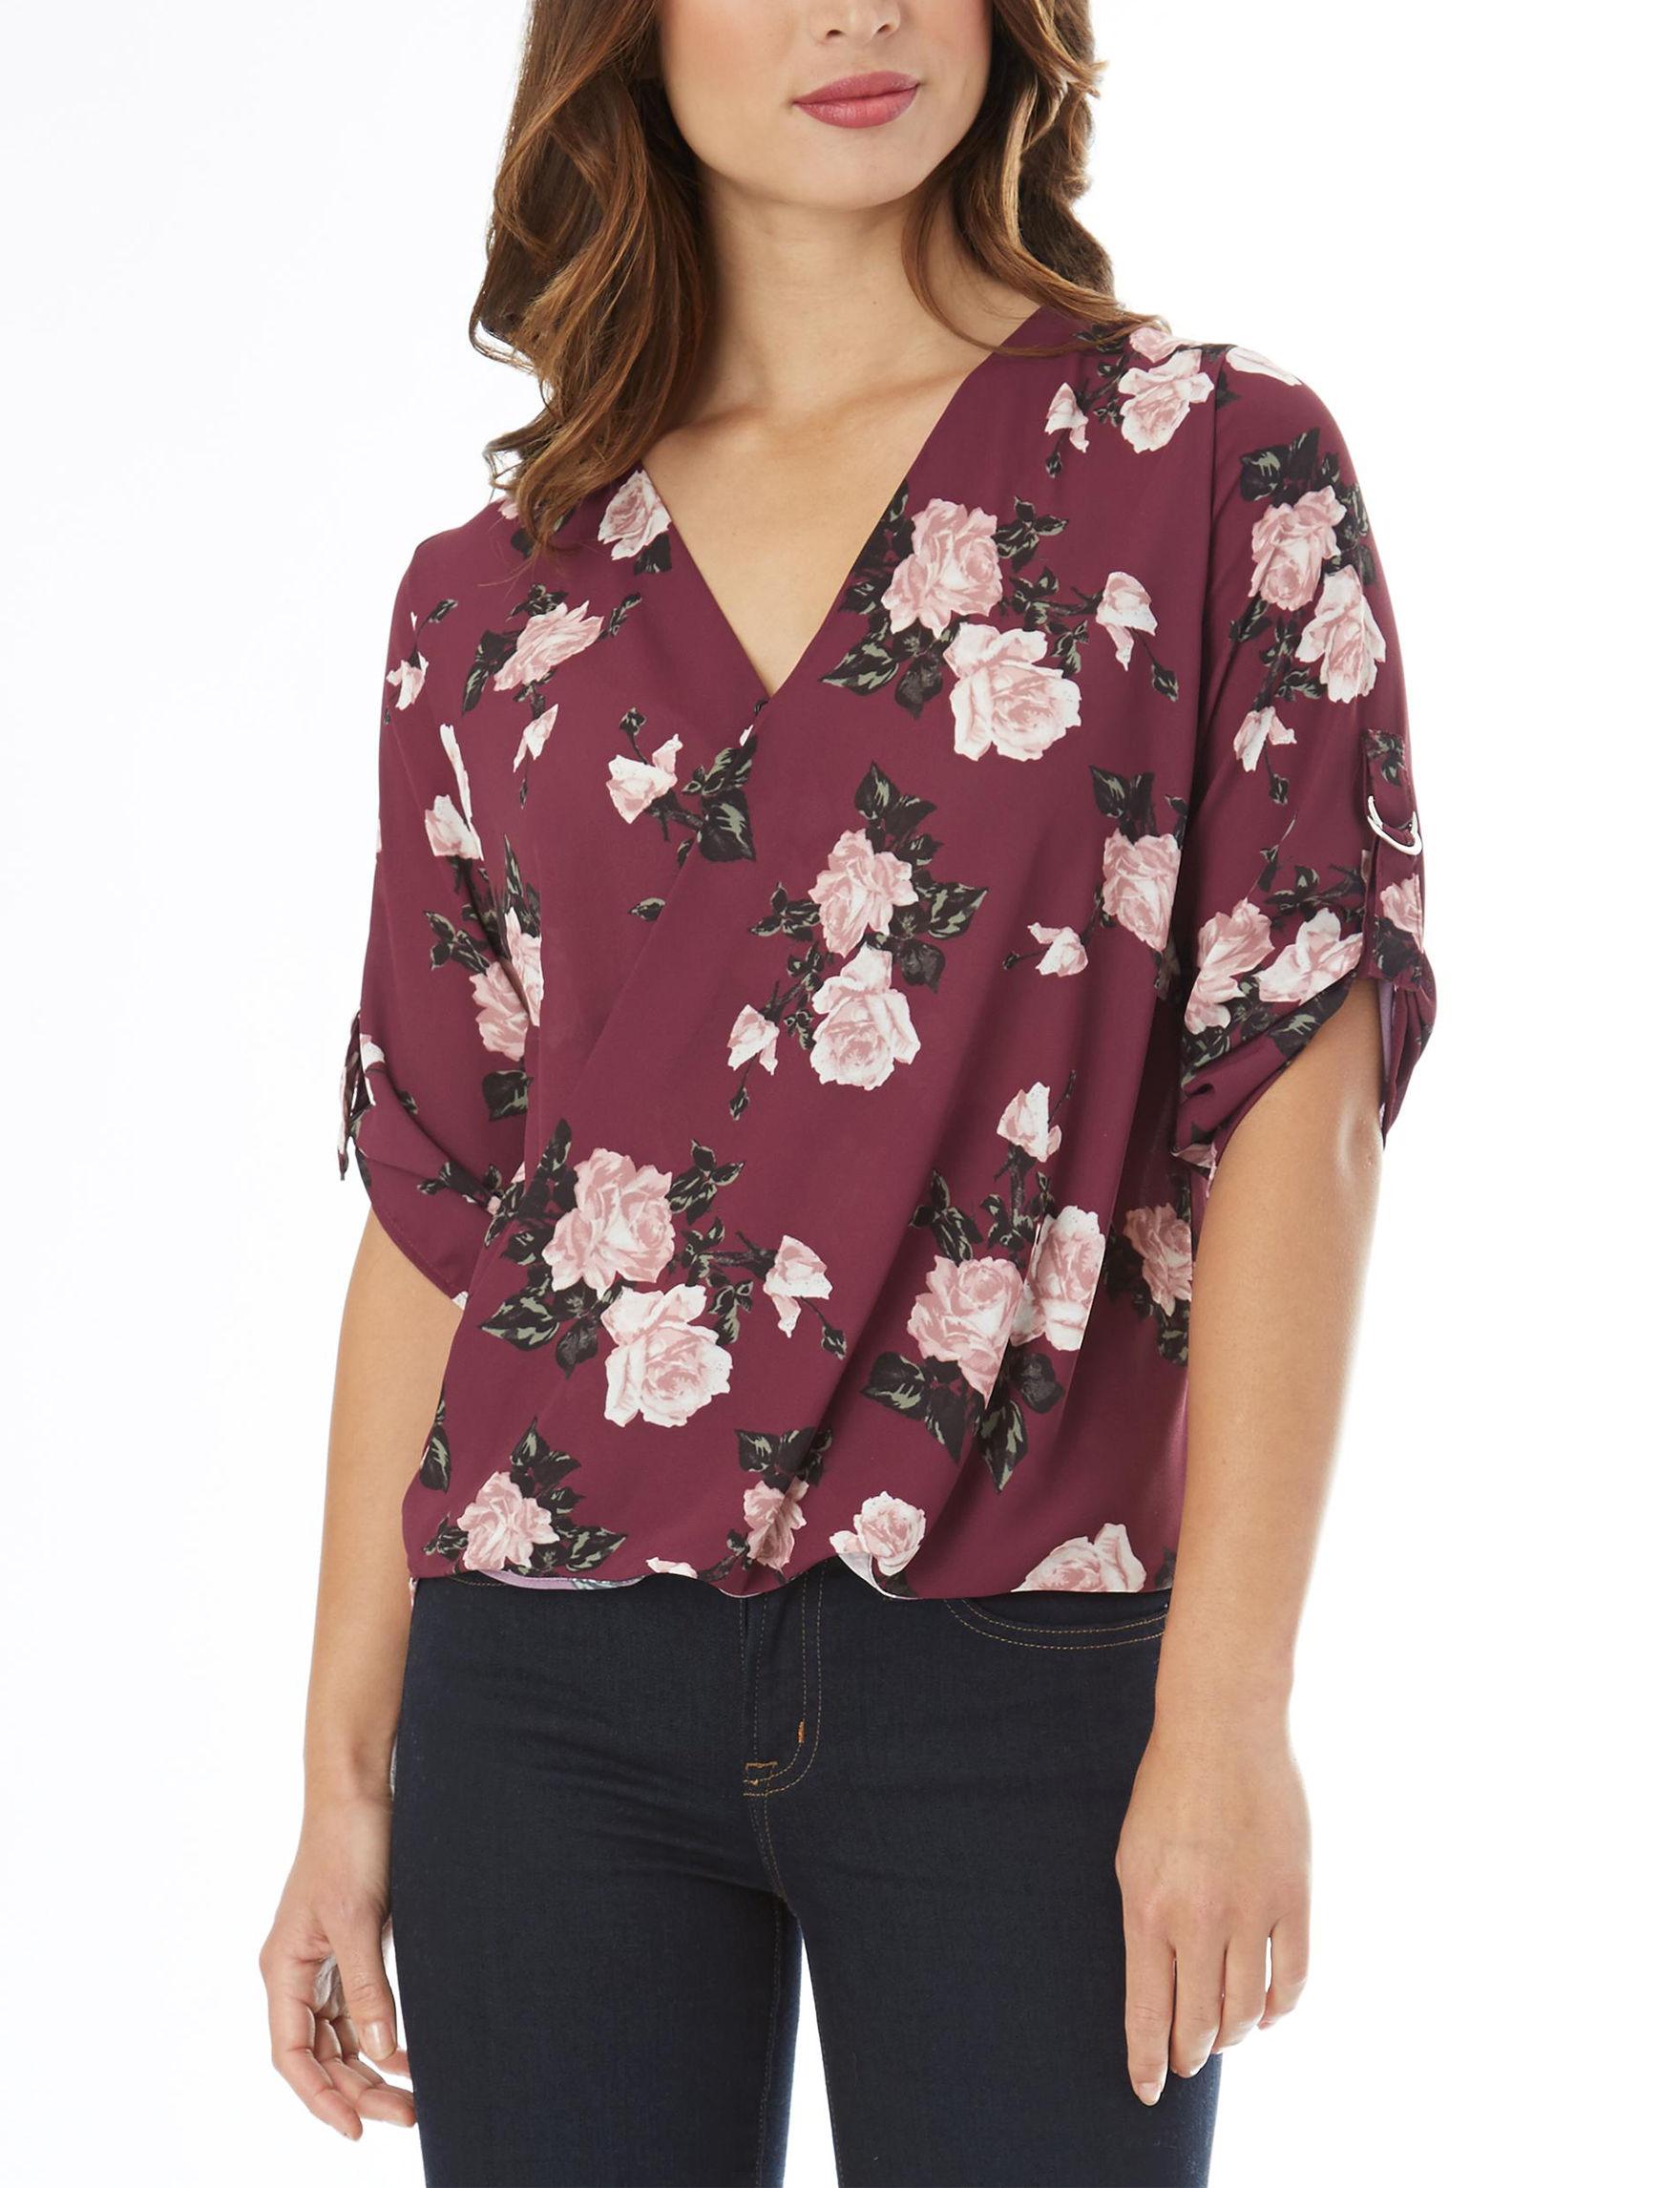 A. Byer Burgundy Shirts & Blouses